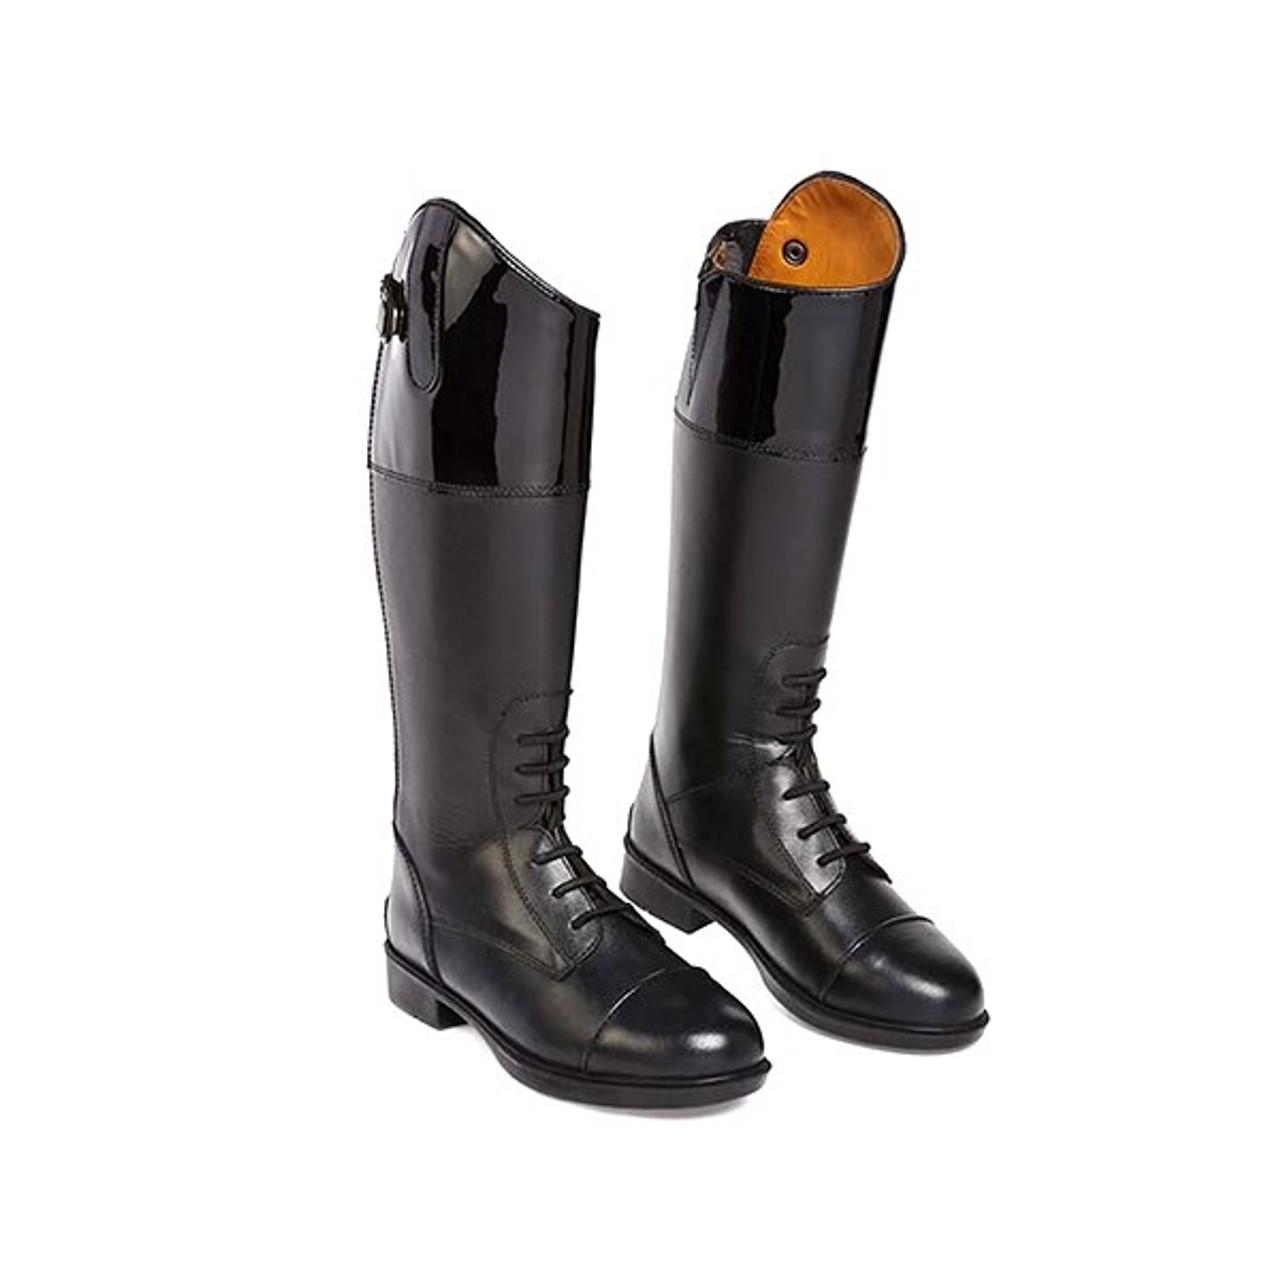 Chelico Amelia Kids Patent Top Riding Boots Black